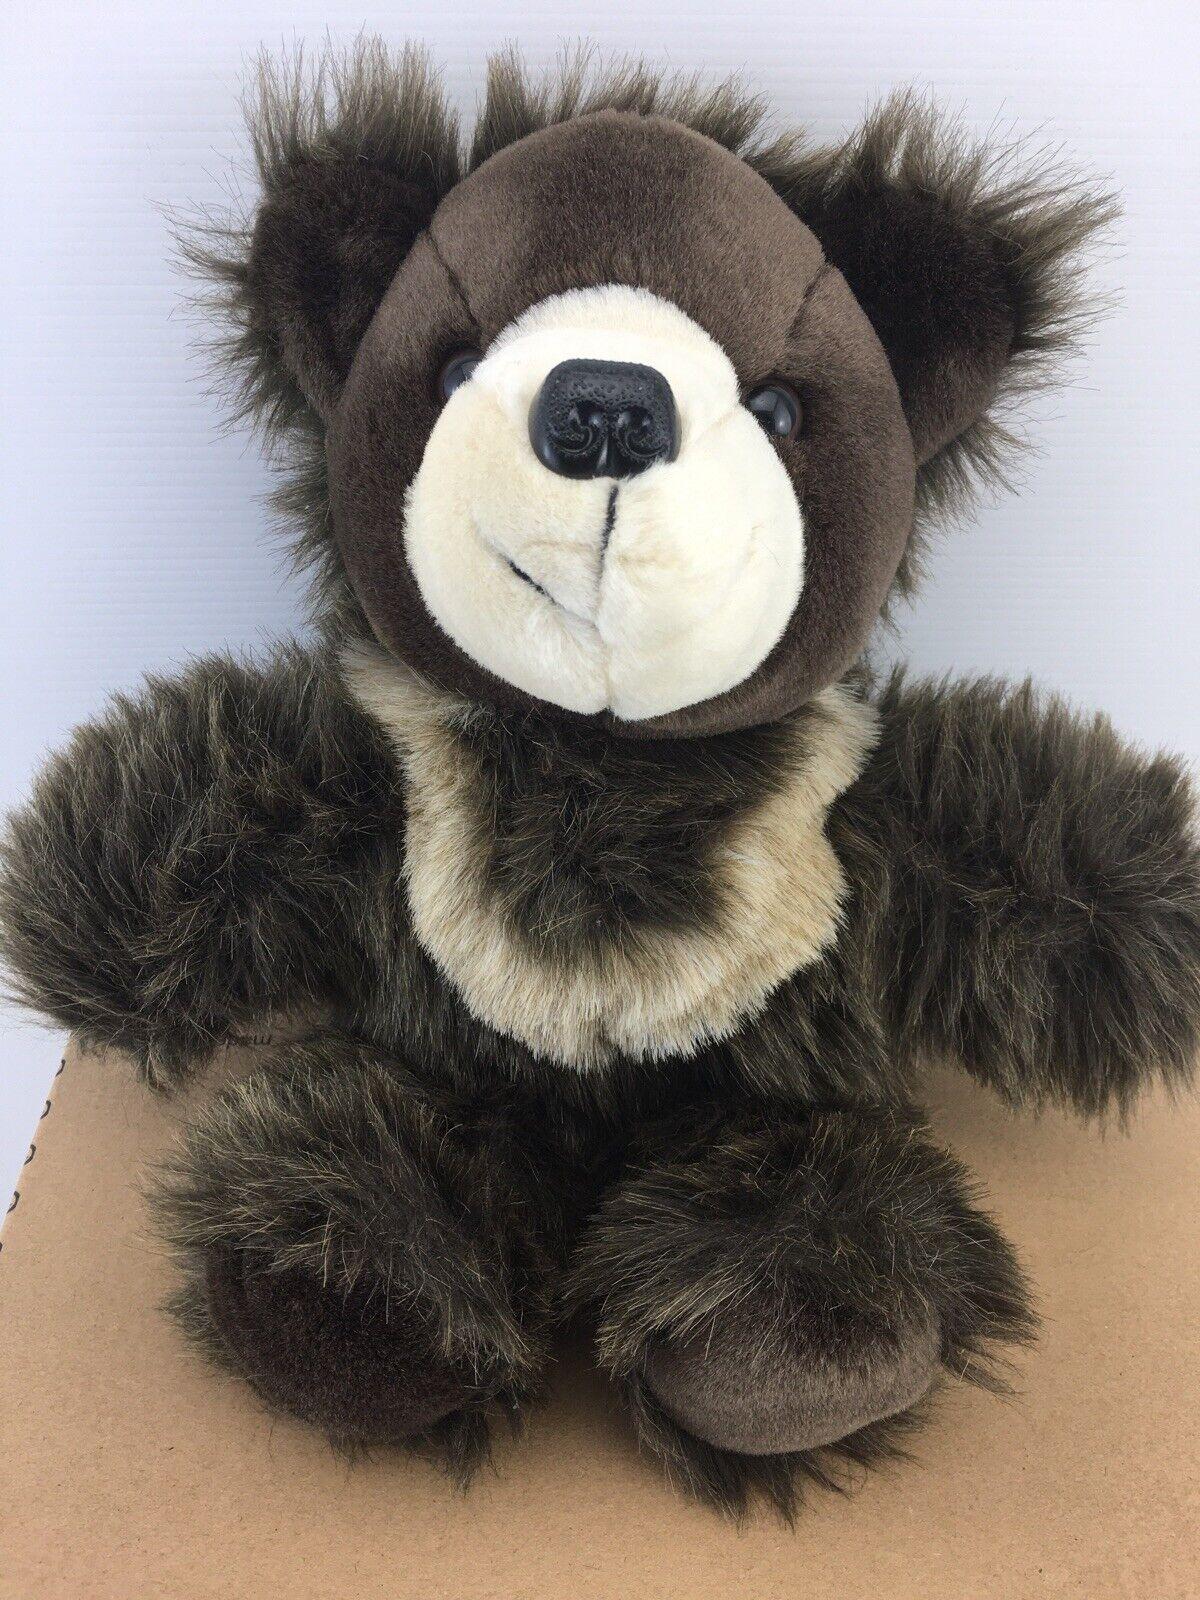 Sunbear Stuffed Animal, Hansa Sitting Sun Bear Realistic Cute Soft Animal Plush Toy 23cm For Sale Online Ebay